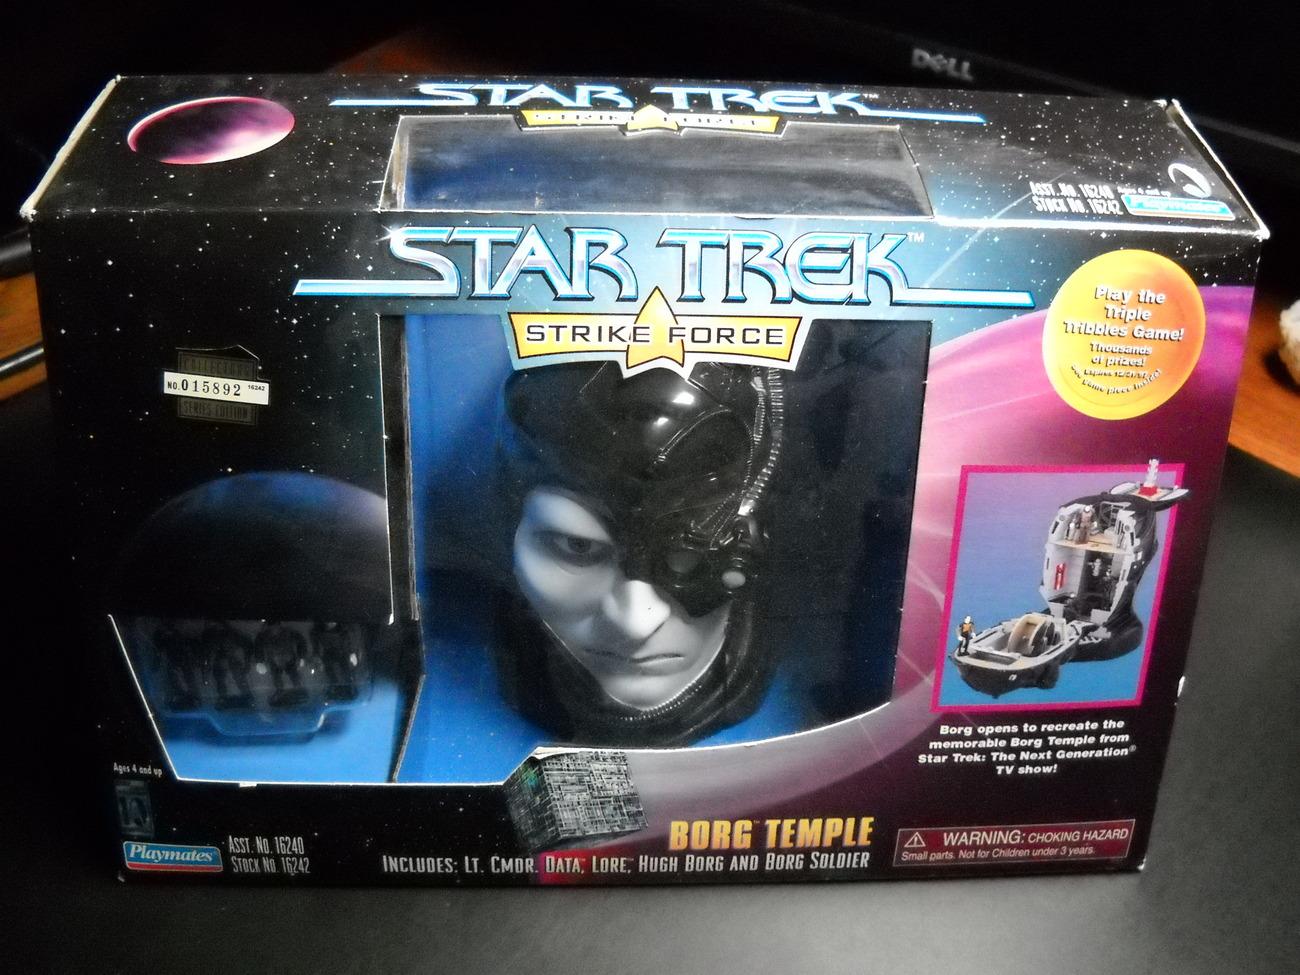 Toy star trek playmates strike force borg temple 1997 moc 01